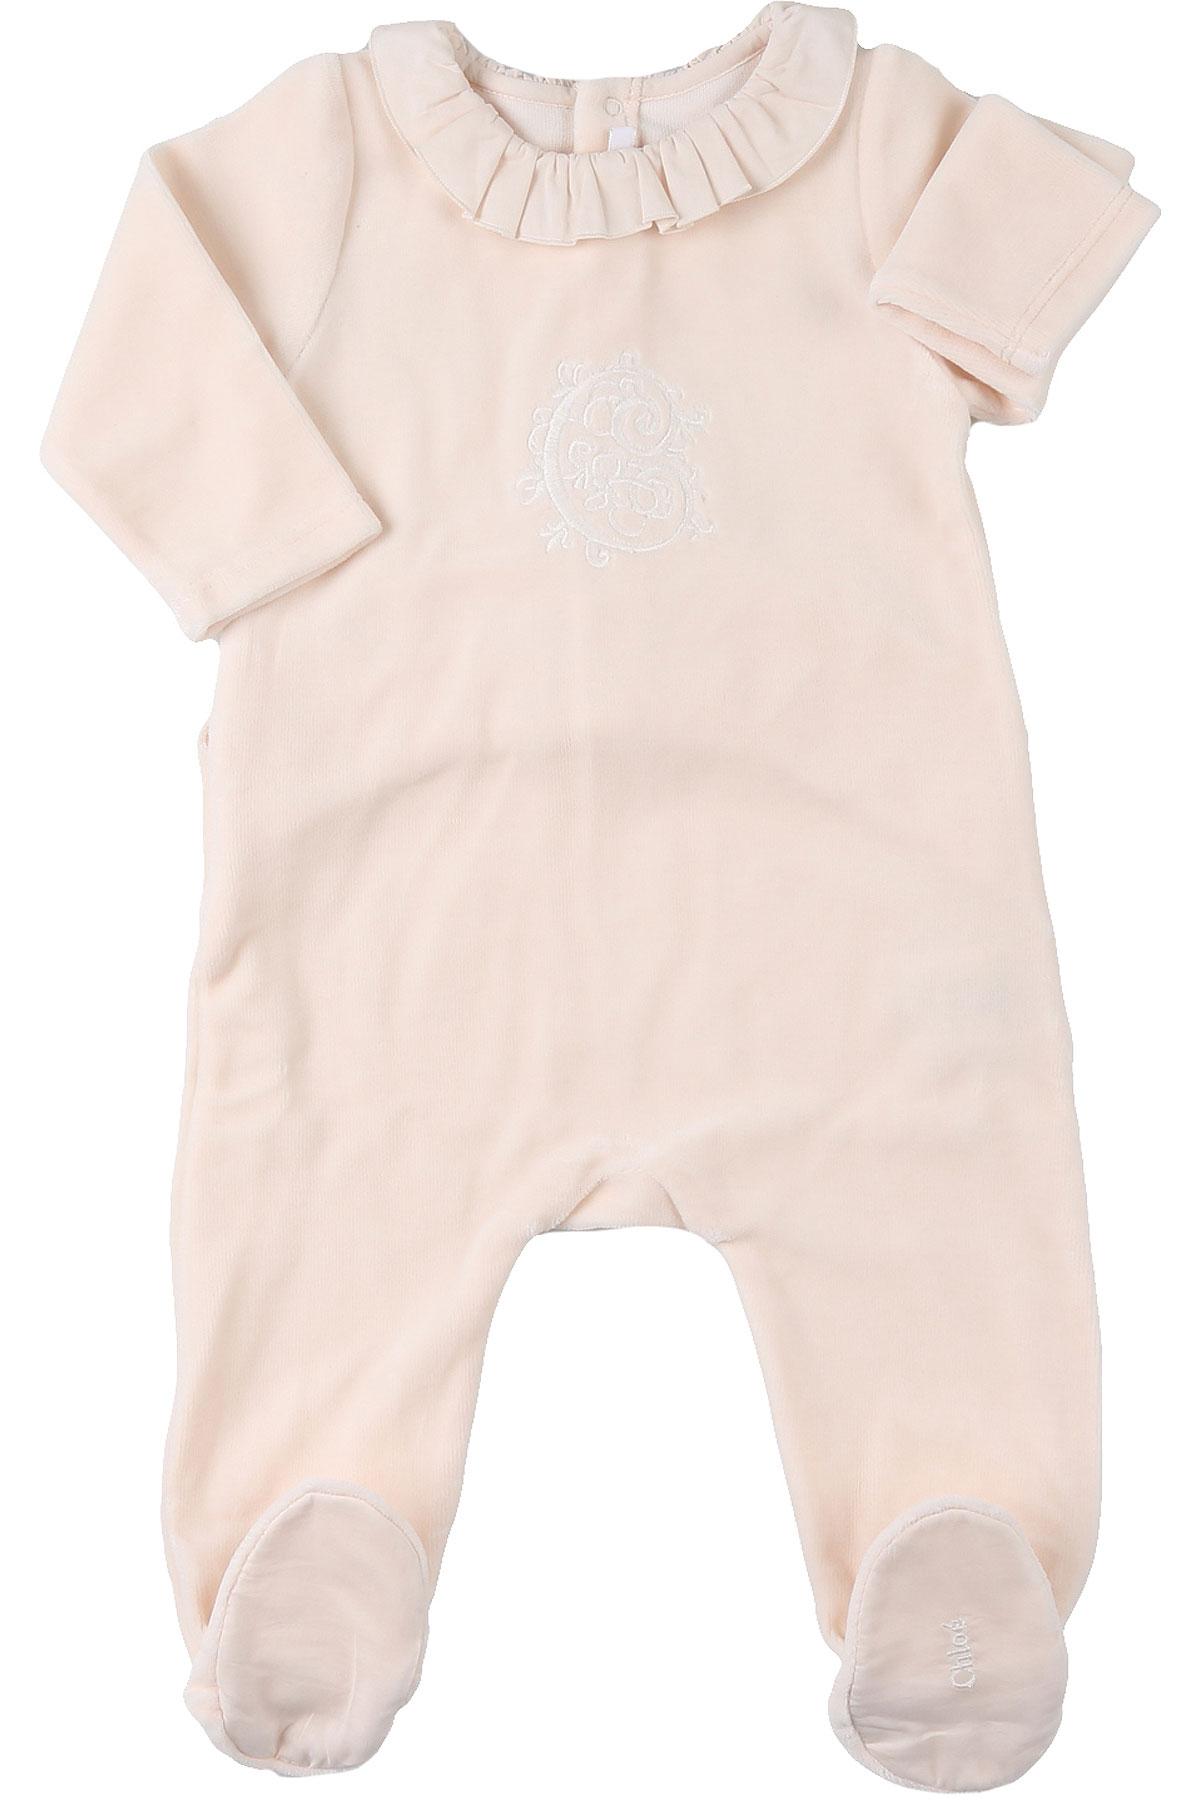 Chloe Baby Bodysuits & Onesies for Girls On Sale, Light Salmon, Cotton, 2019, 1M 3Y 6M